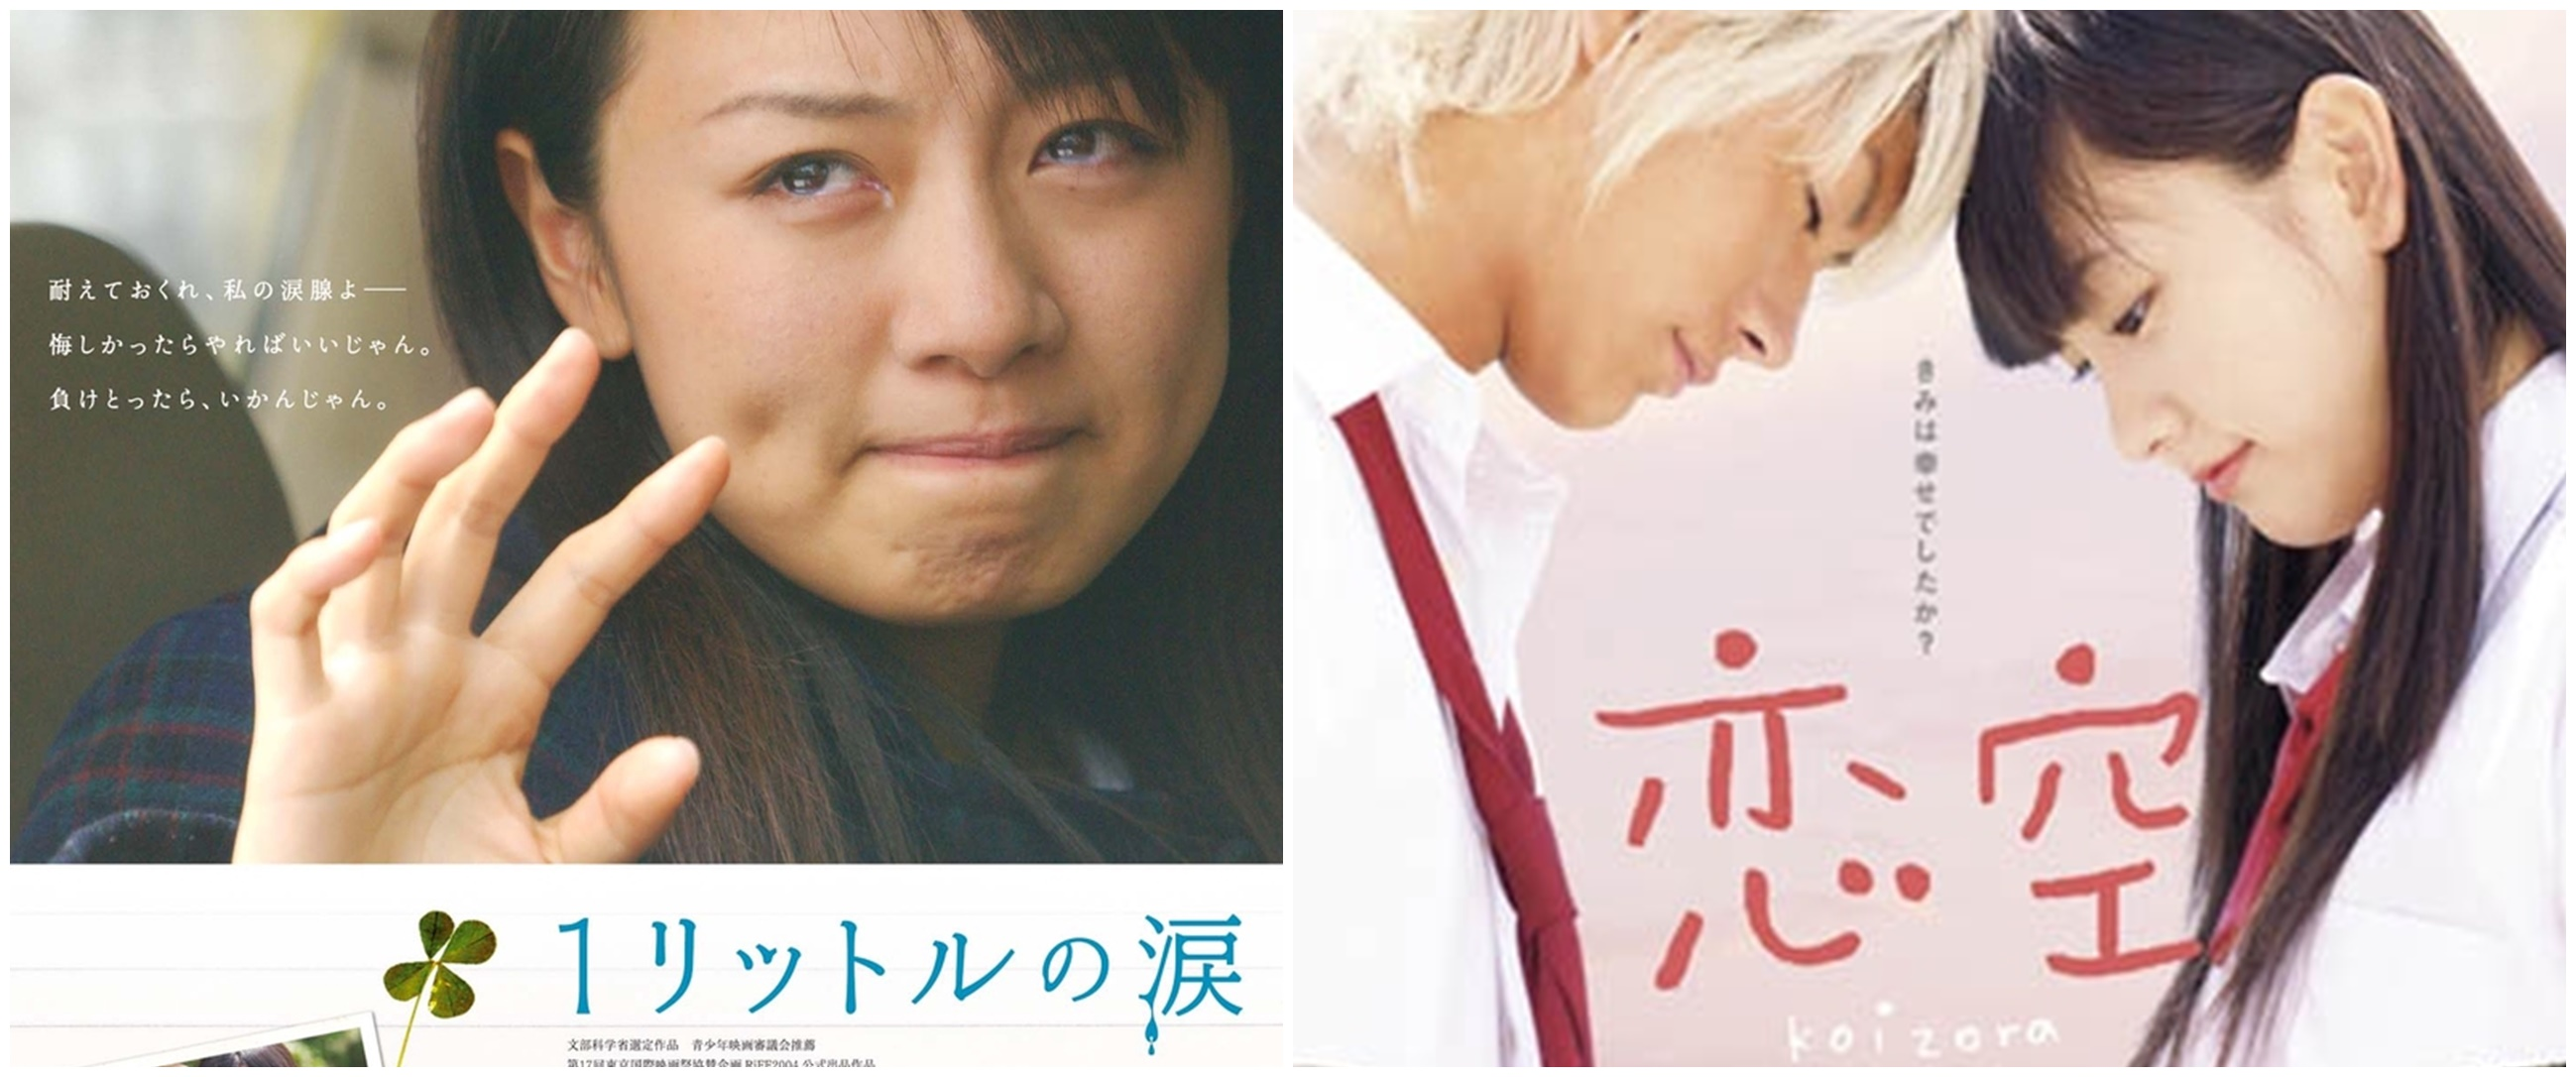 10 Film dan drama Jepang paling sedih dan bikin baper